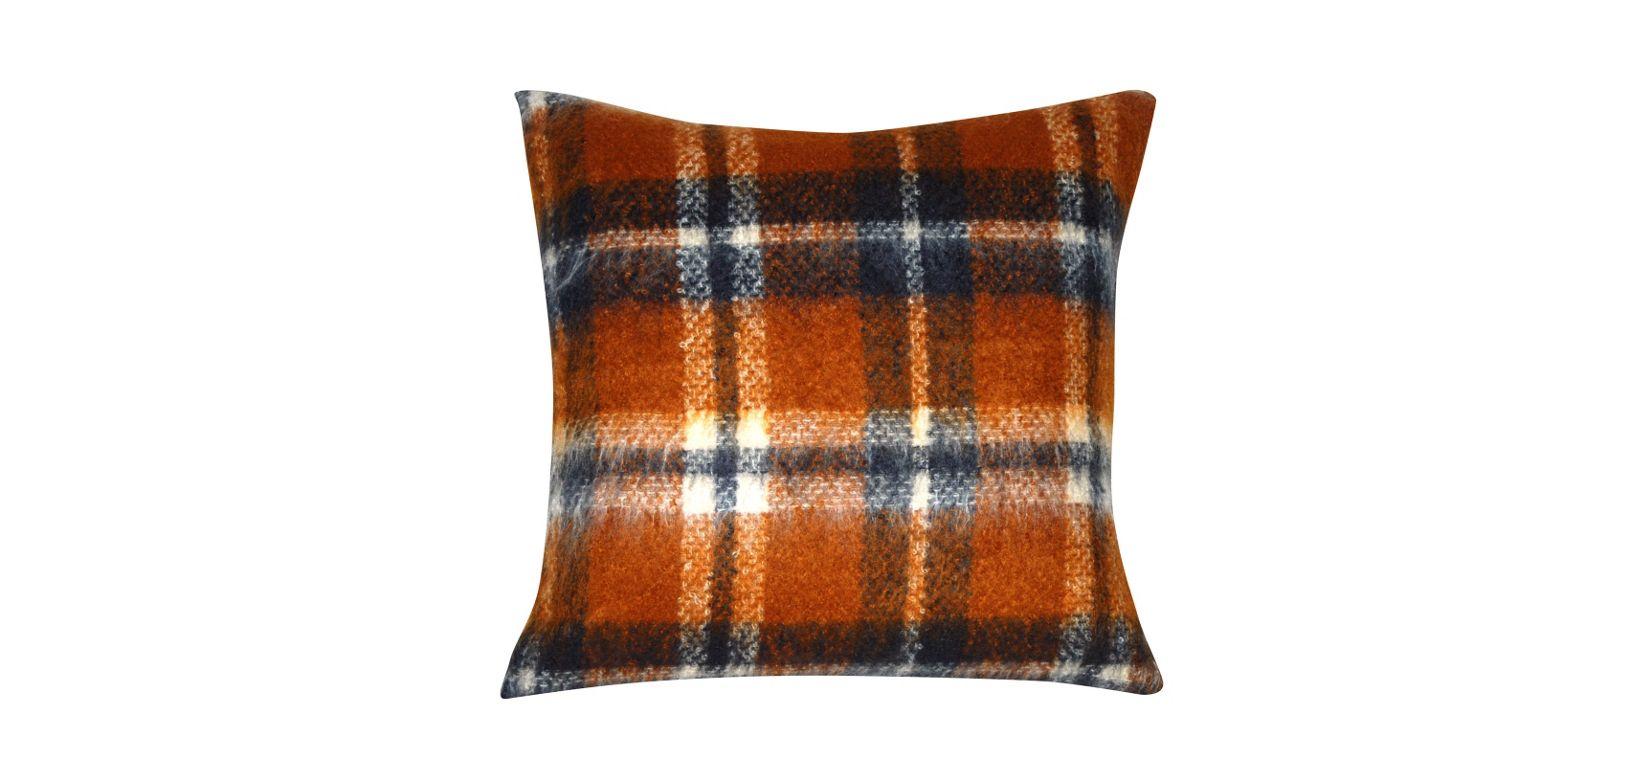 sir jean paul gaultier coussin collection nouveaux. Black Bedroom Furniture Sets. Home Design Ideas